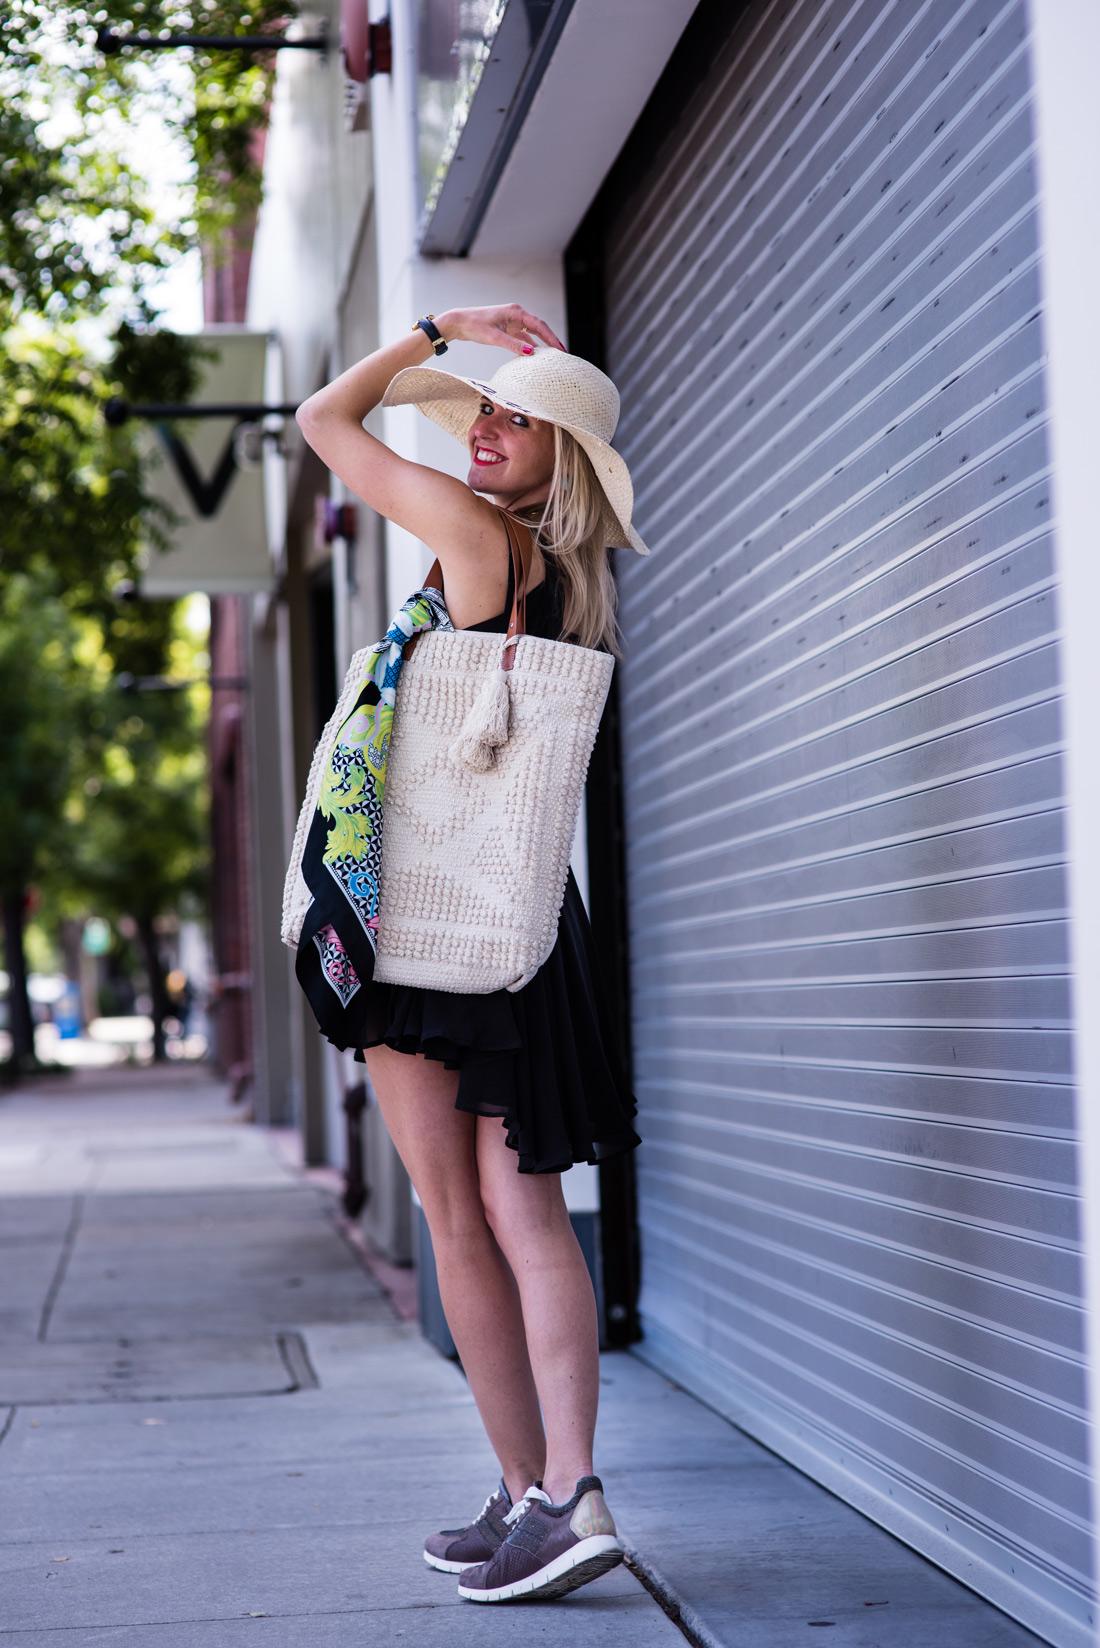 Bag-at-you---Fashion-blog---Abercrombie-bag---Summer-look